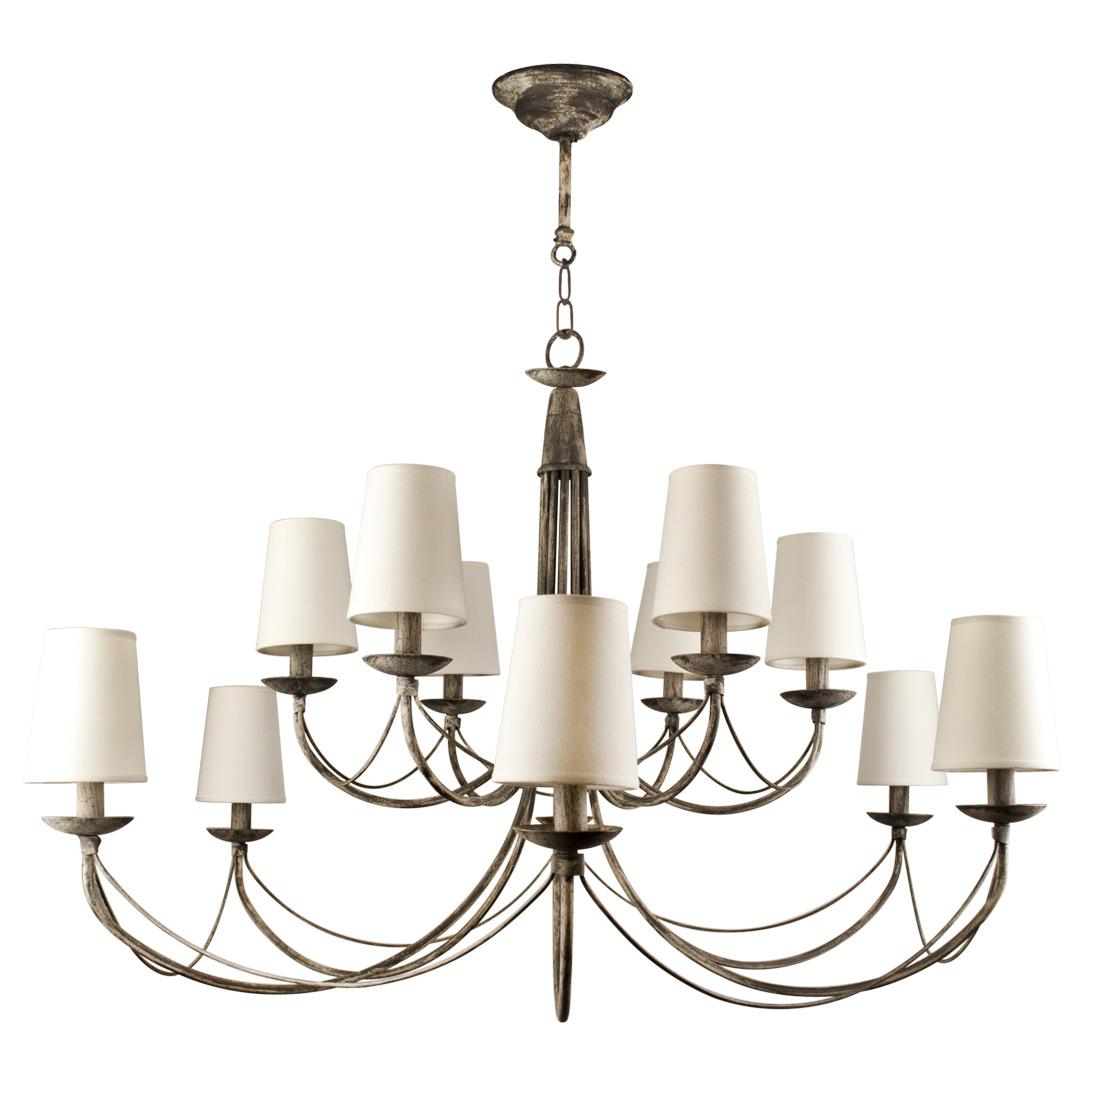 Casa villaverde london villaverde london casa metal chandelier shades square arubaitofo Images